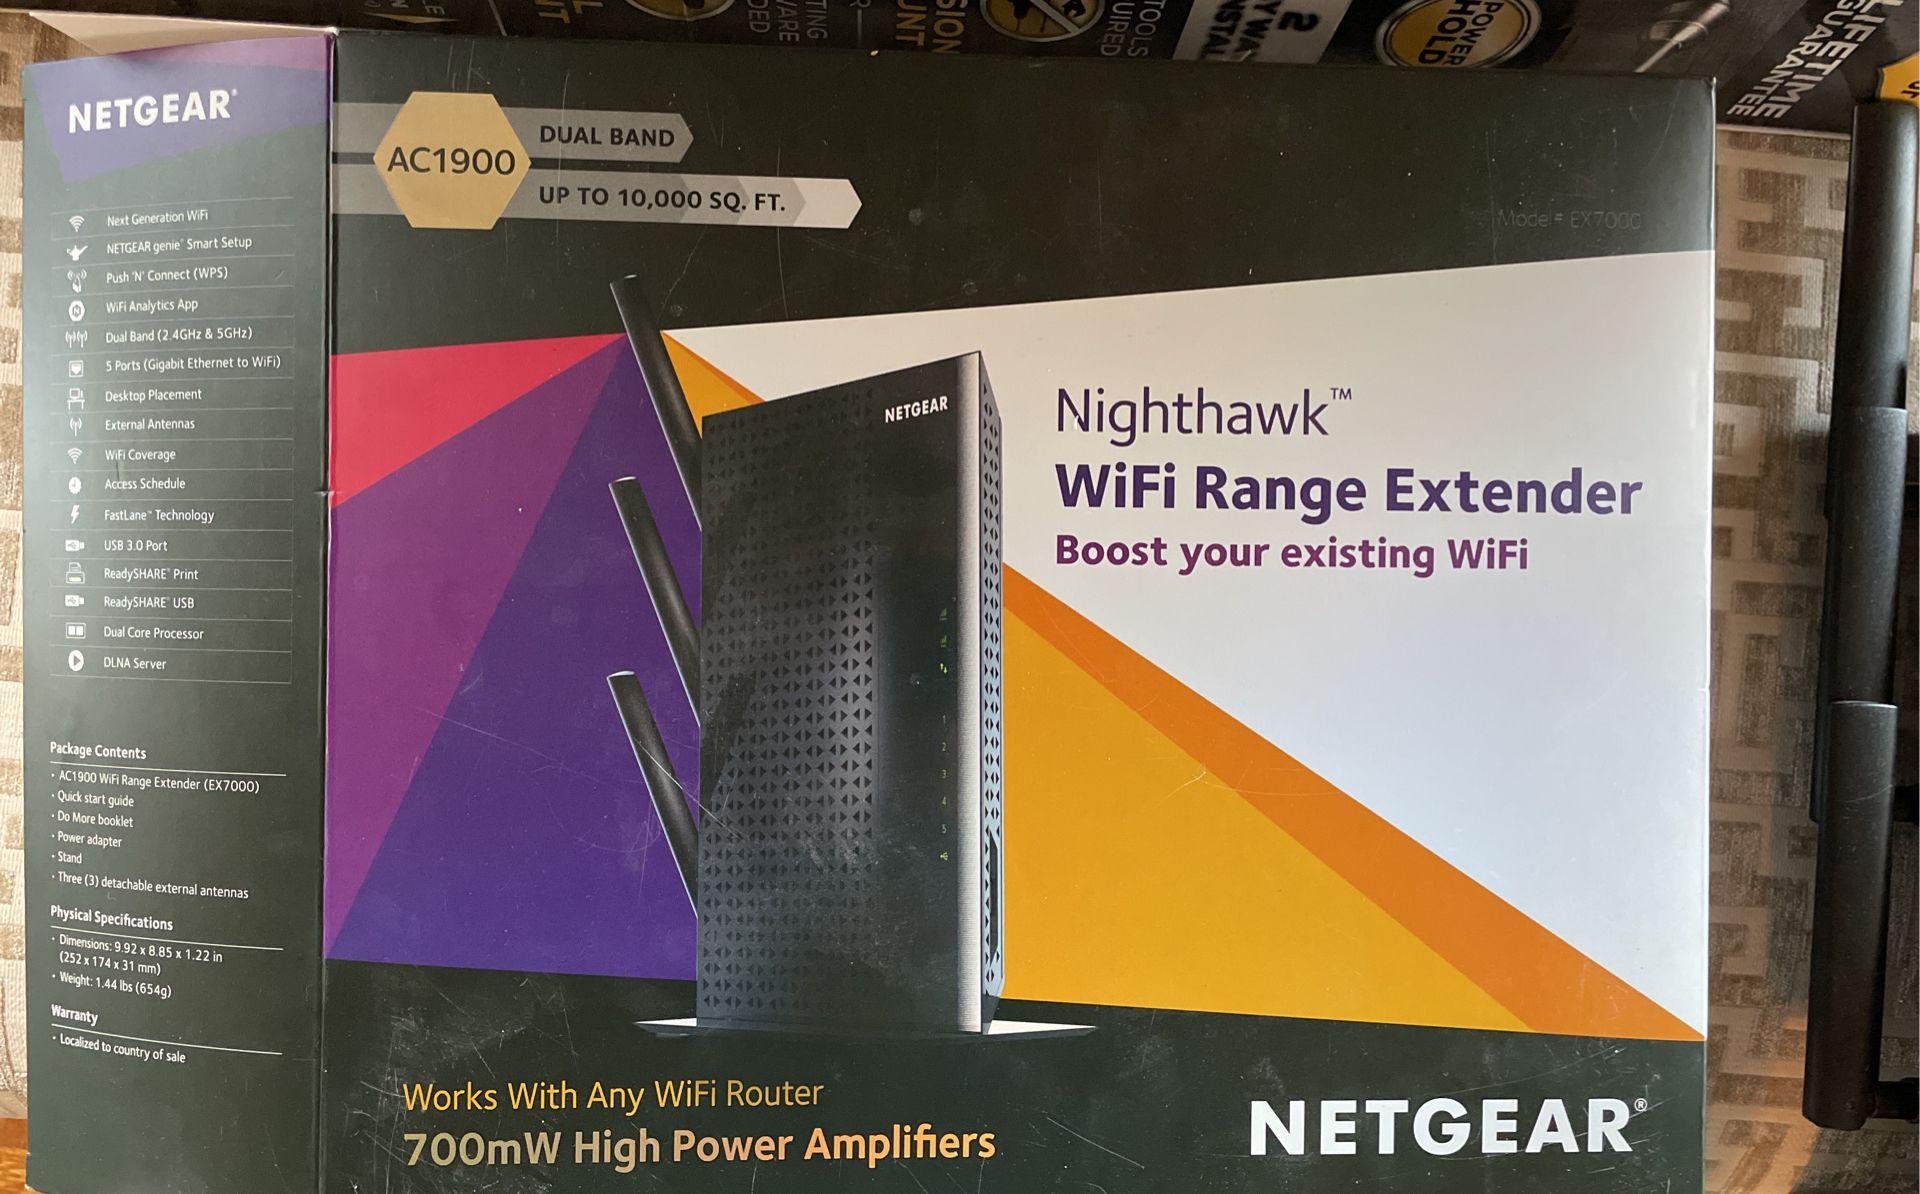 Netgear Nighthawk WiFi Extender